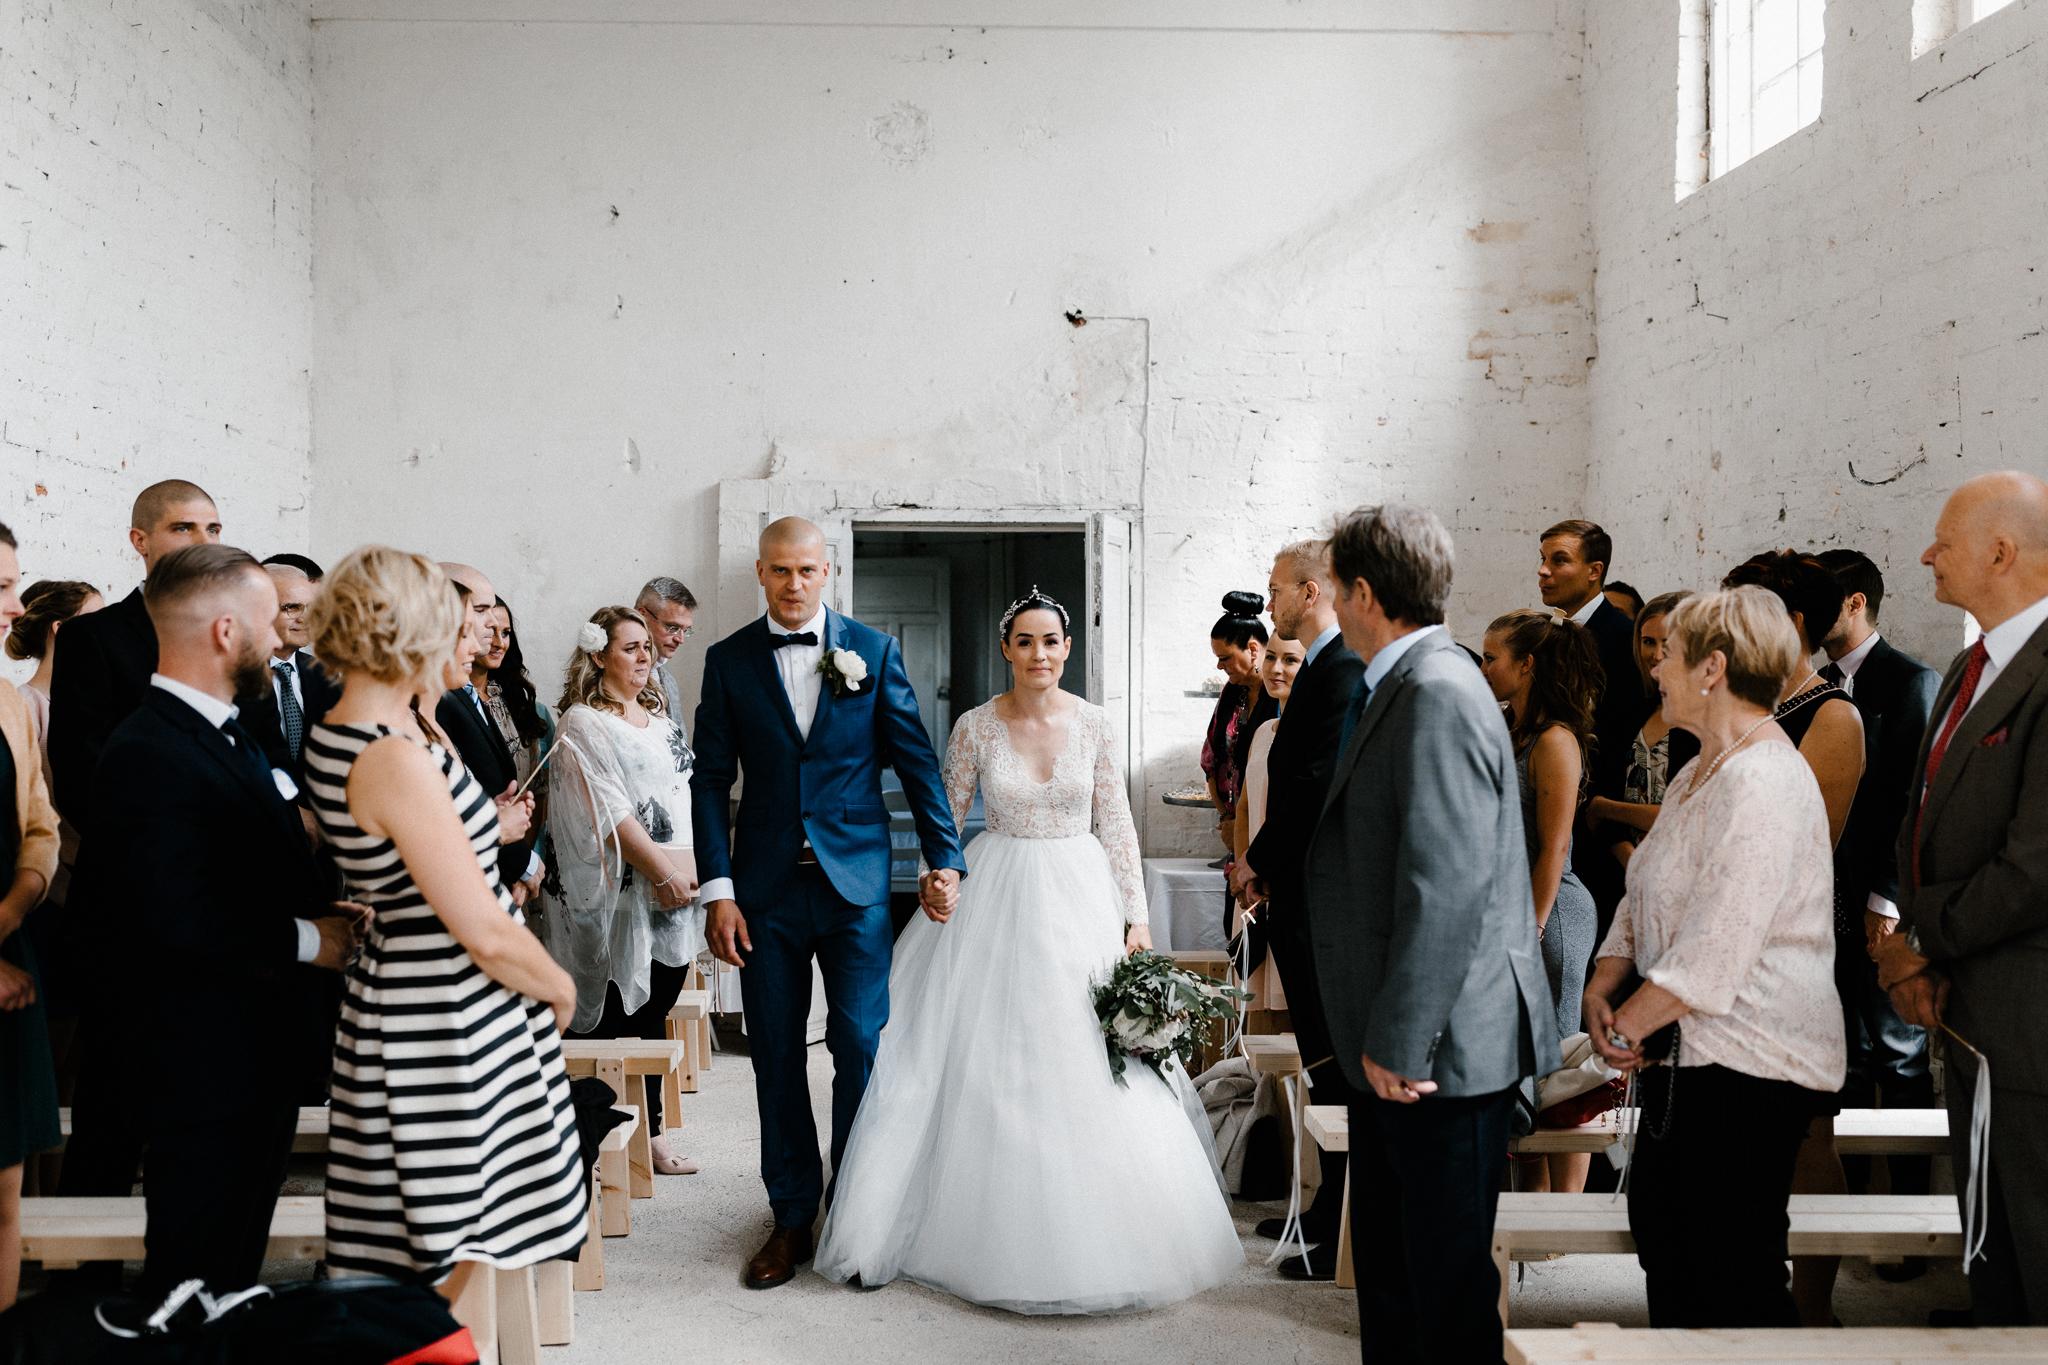 Essi + Ville   Oitbacka Gården   by Patrick Karkkolainen Wedding Photography-148.jpg